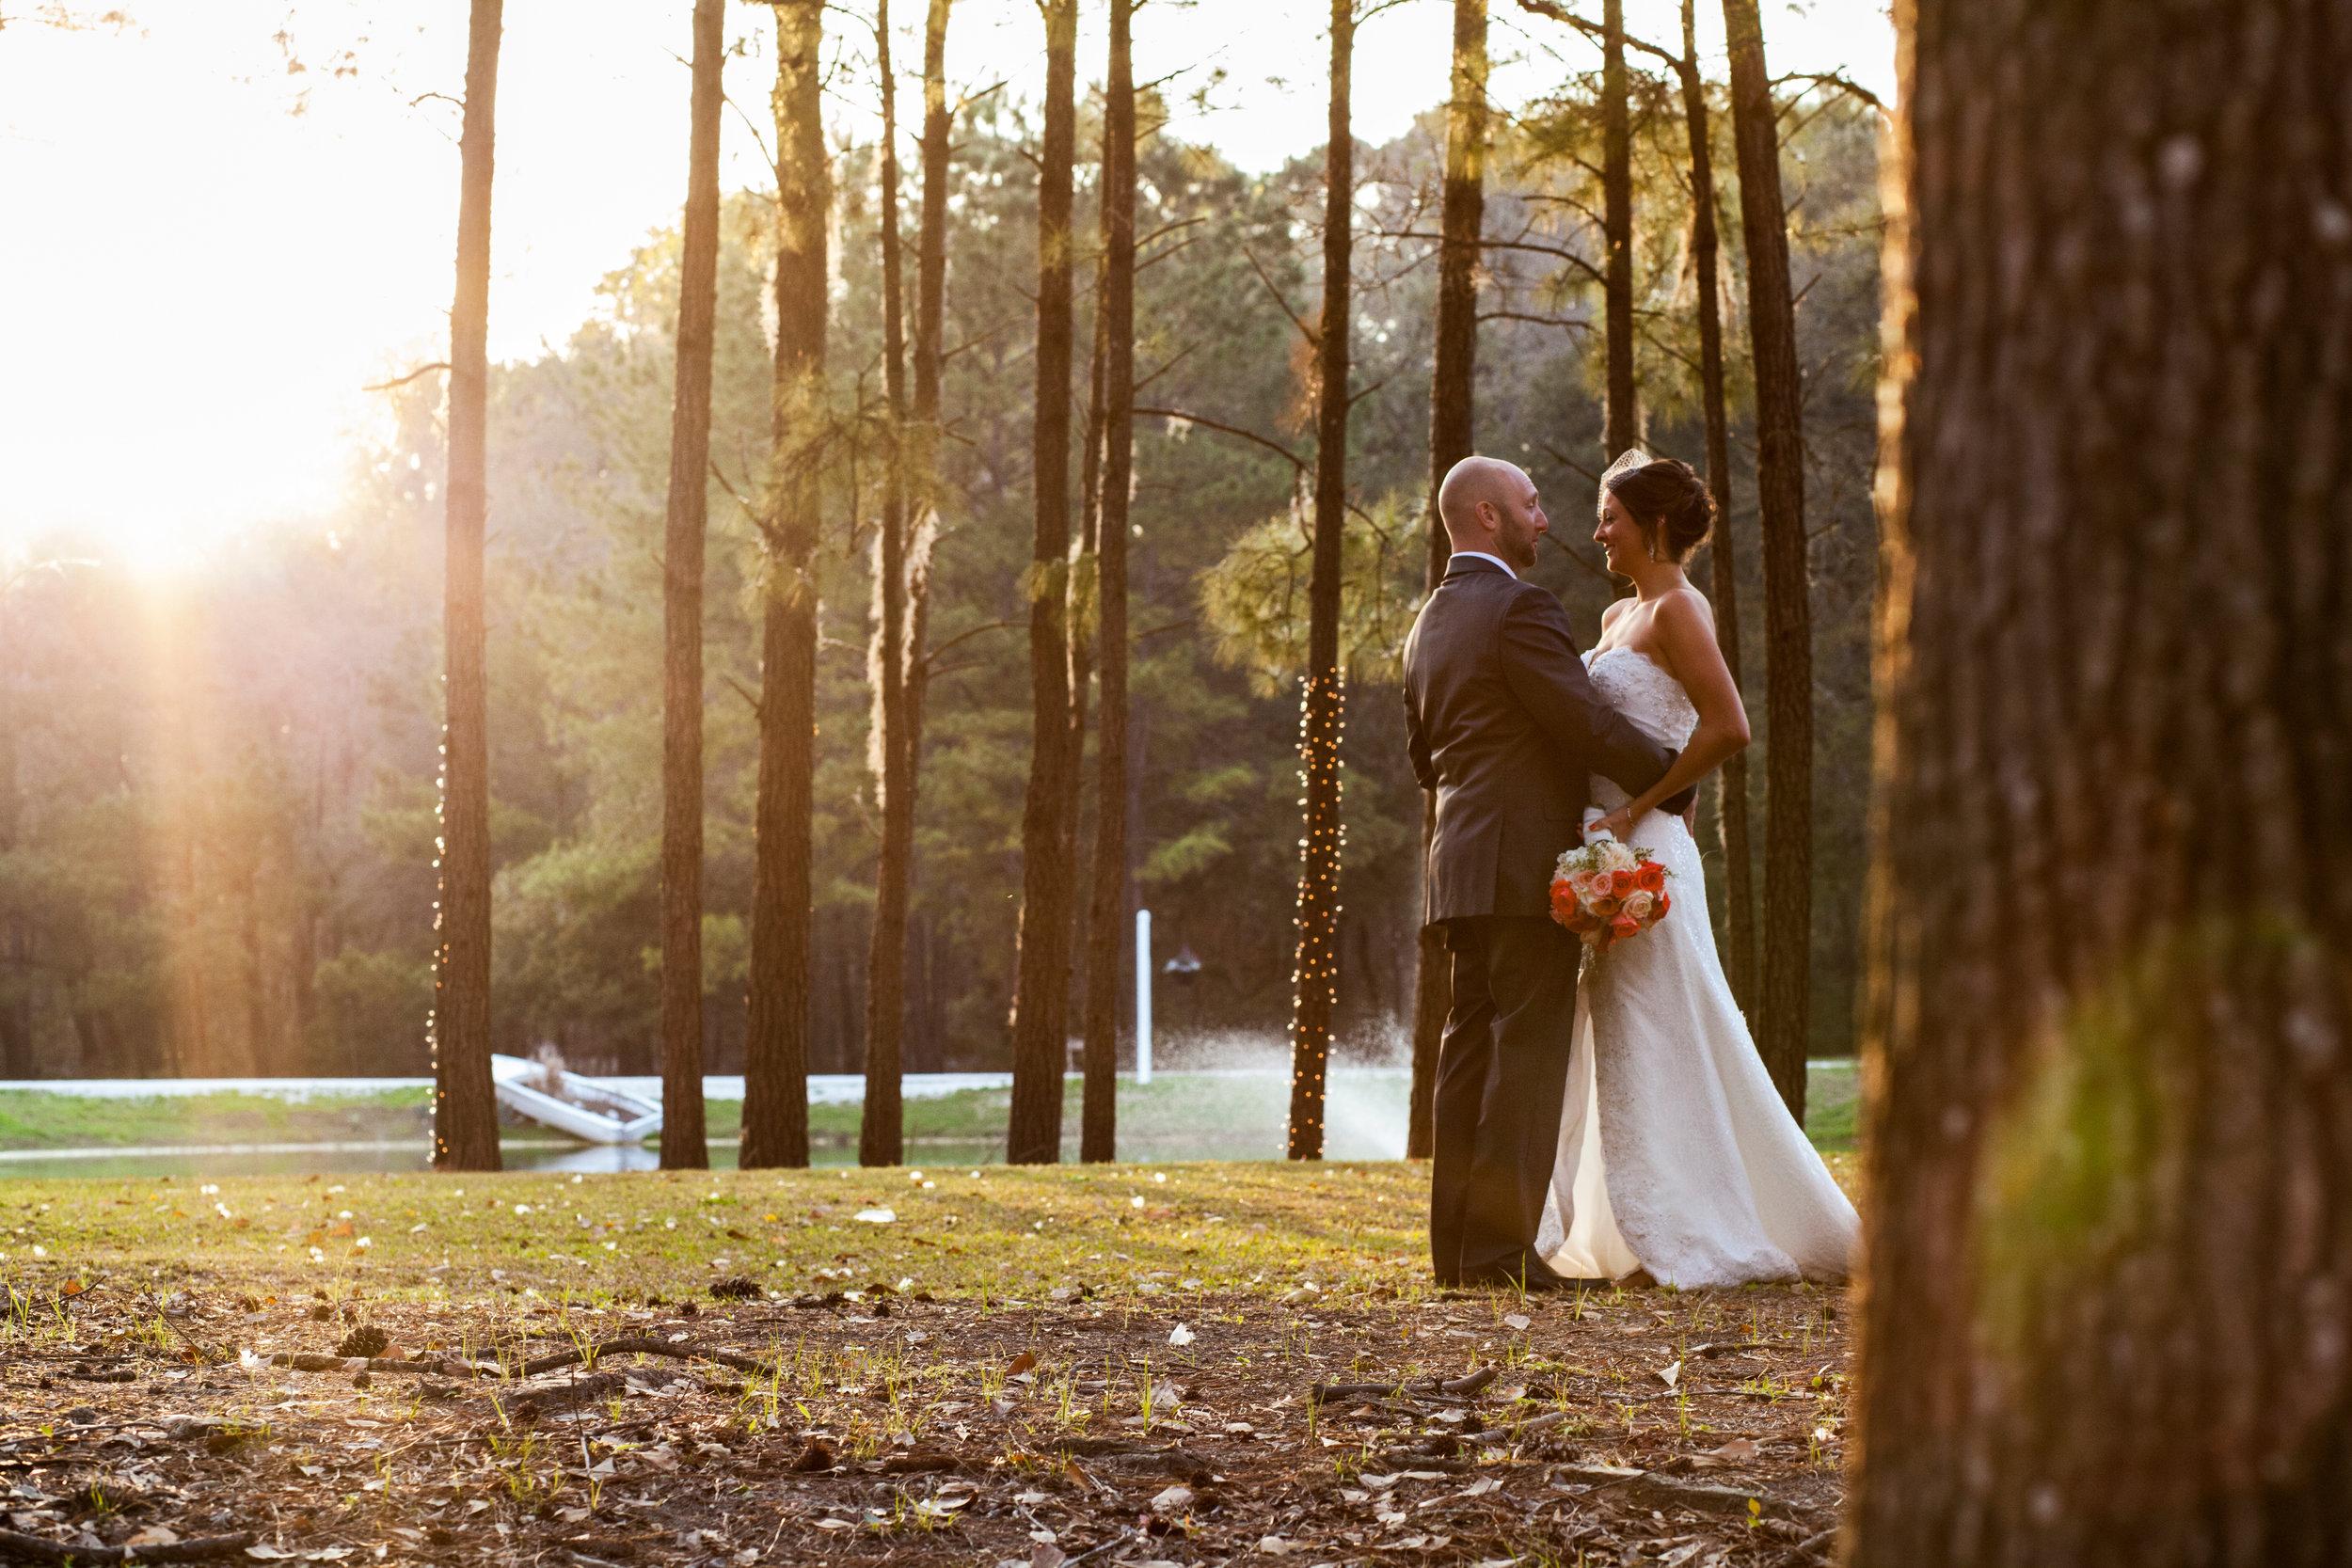 Savannah Wedding - Teresa + Wes